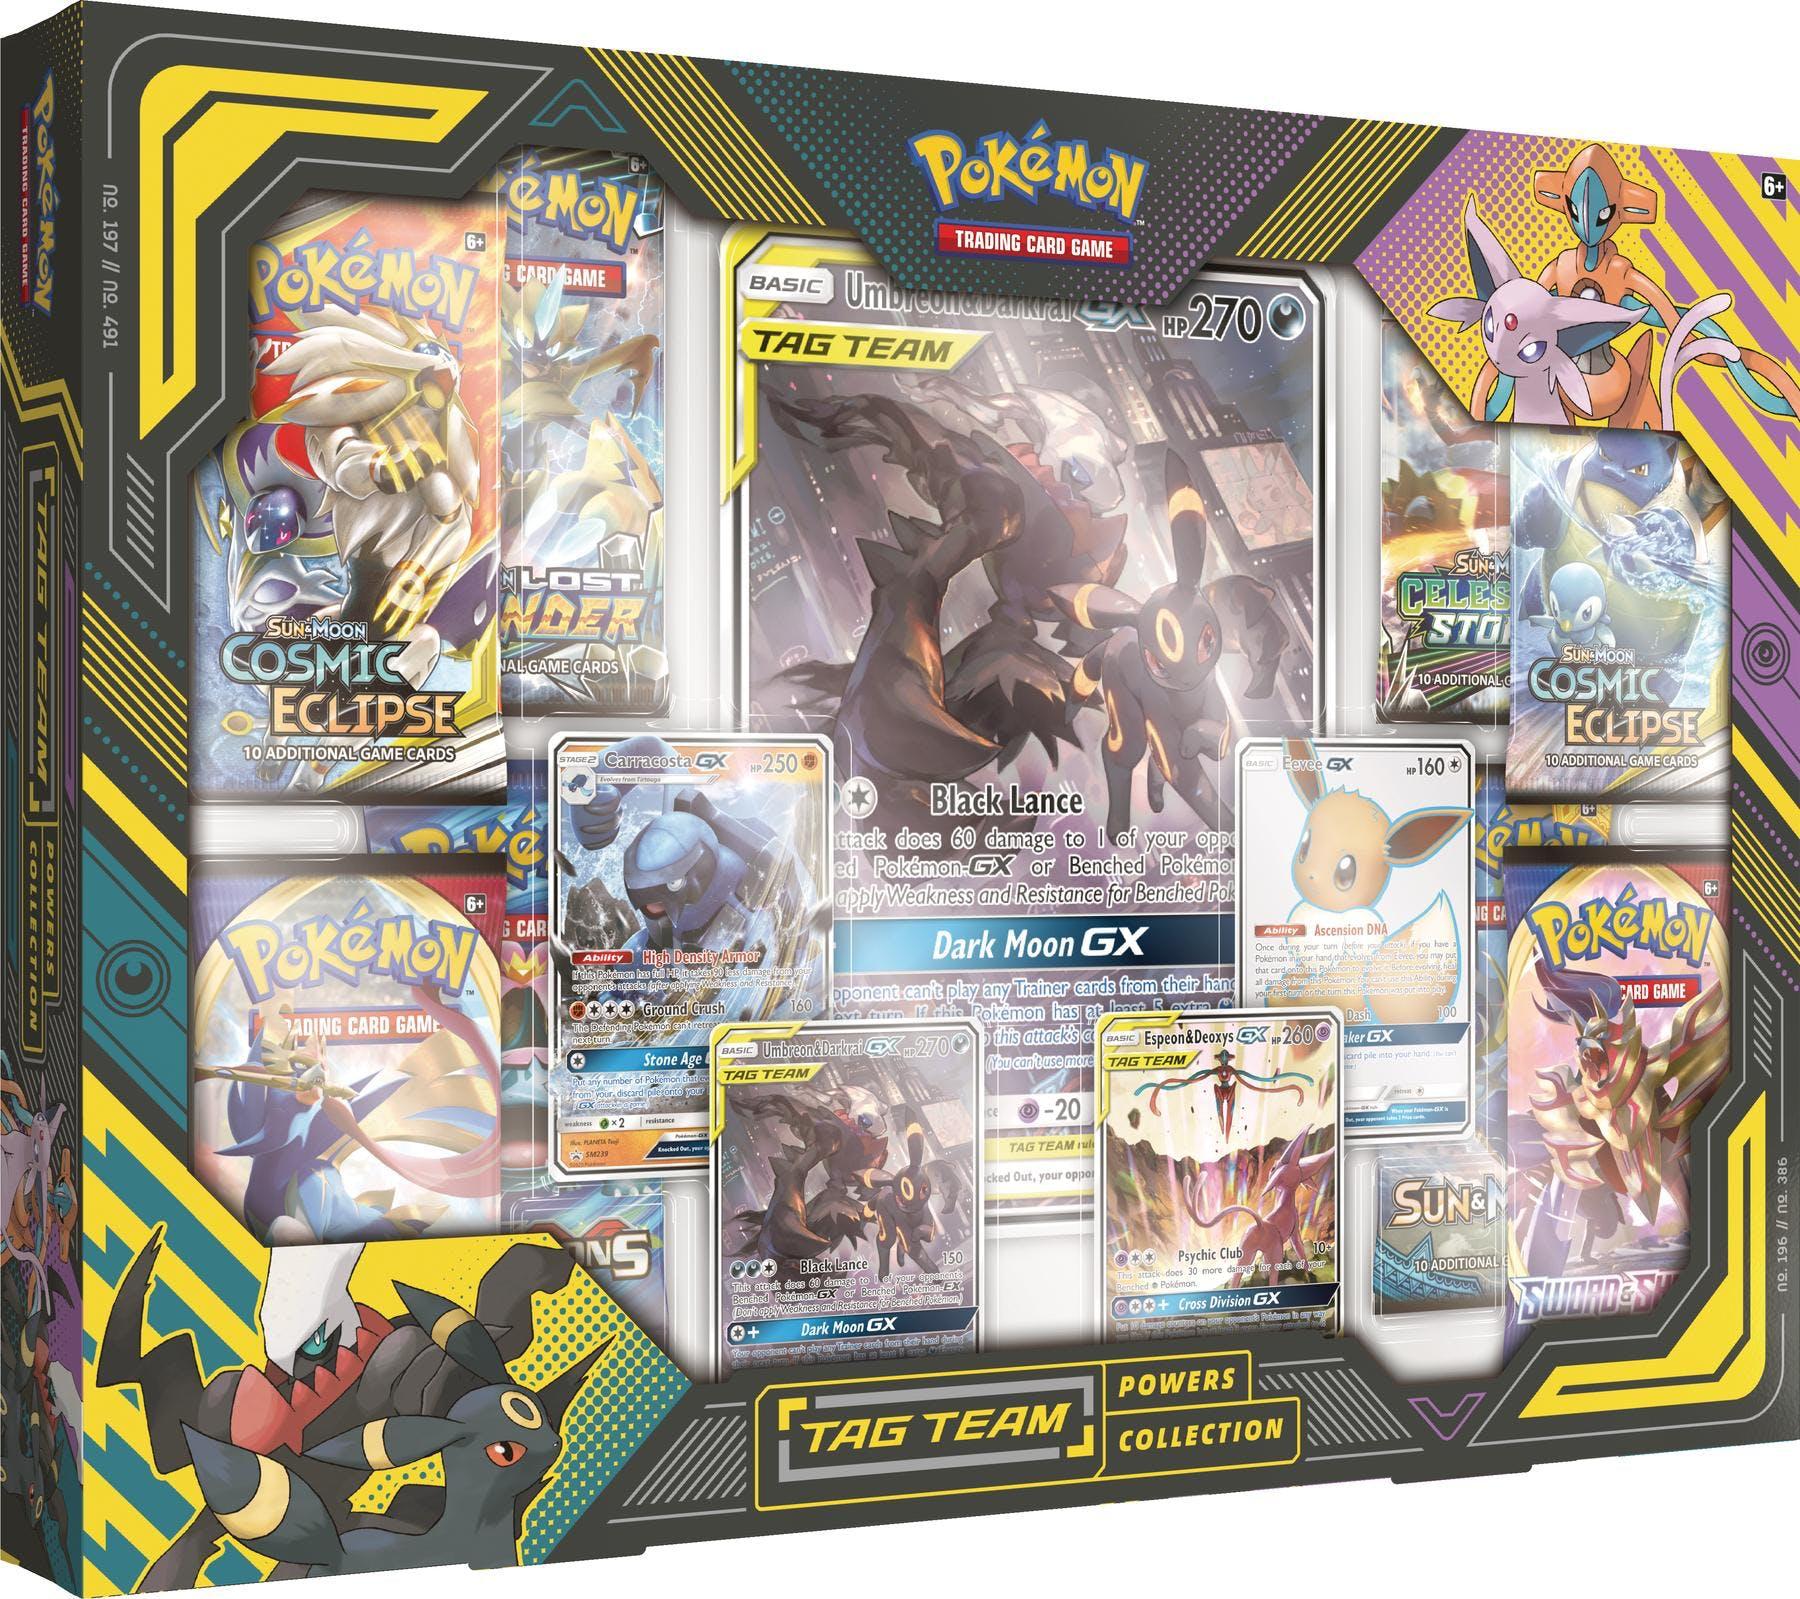 Pokemon Tag Team Umbreon/Darkrai Powers Collection